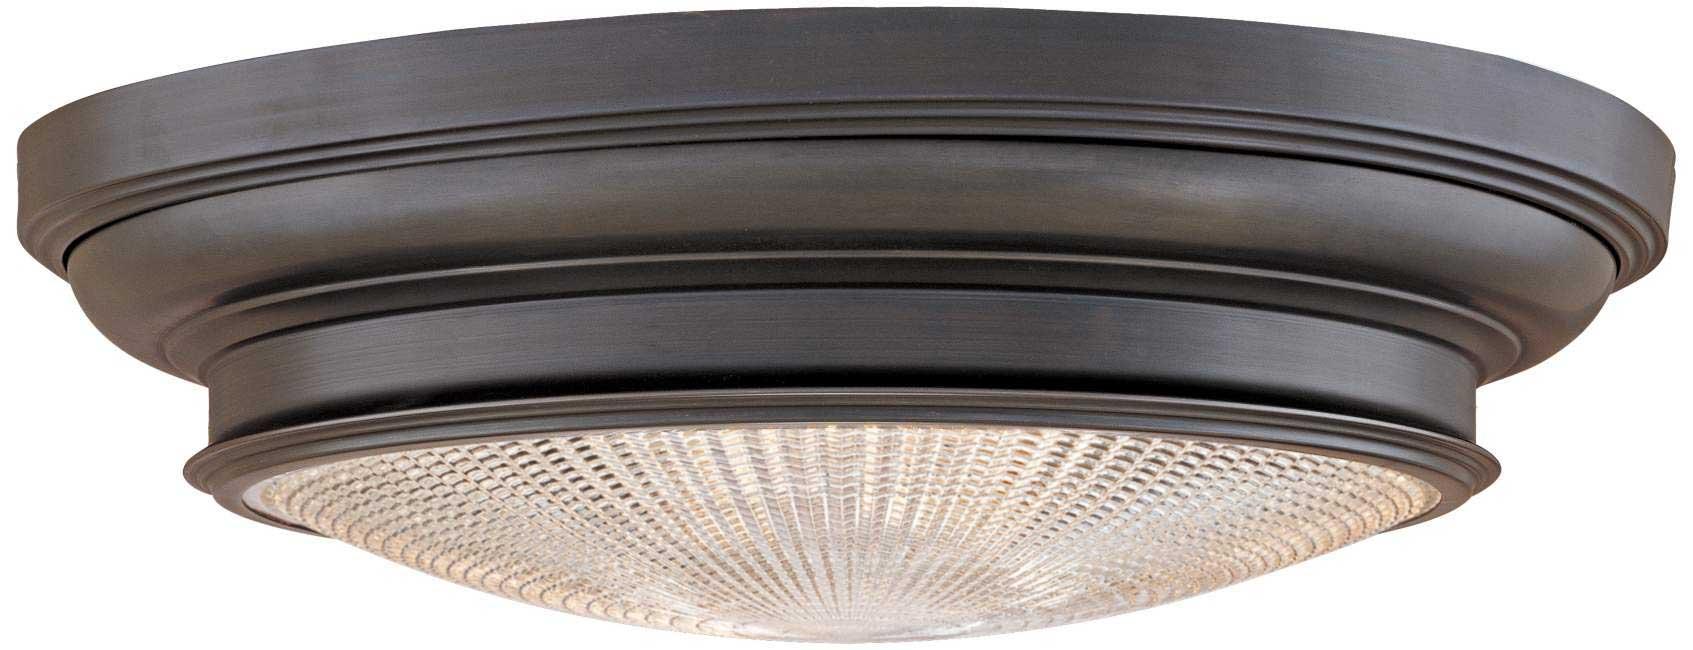 Lighting Luxury Style Woodstock Ceiling Light 325